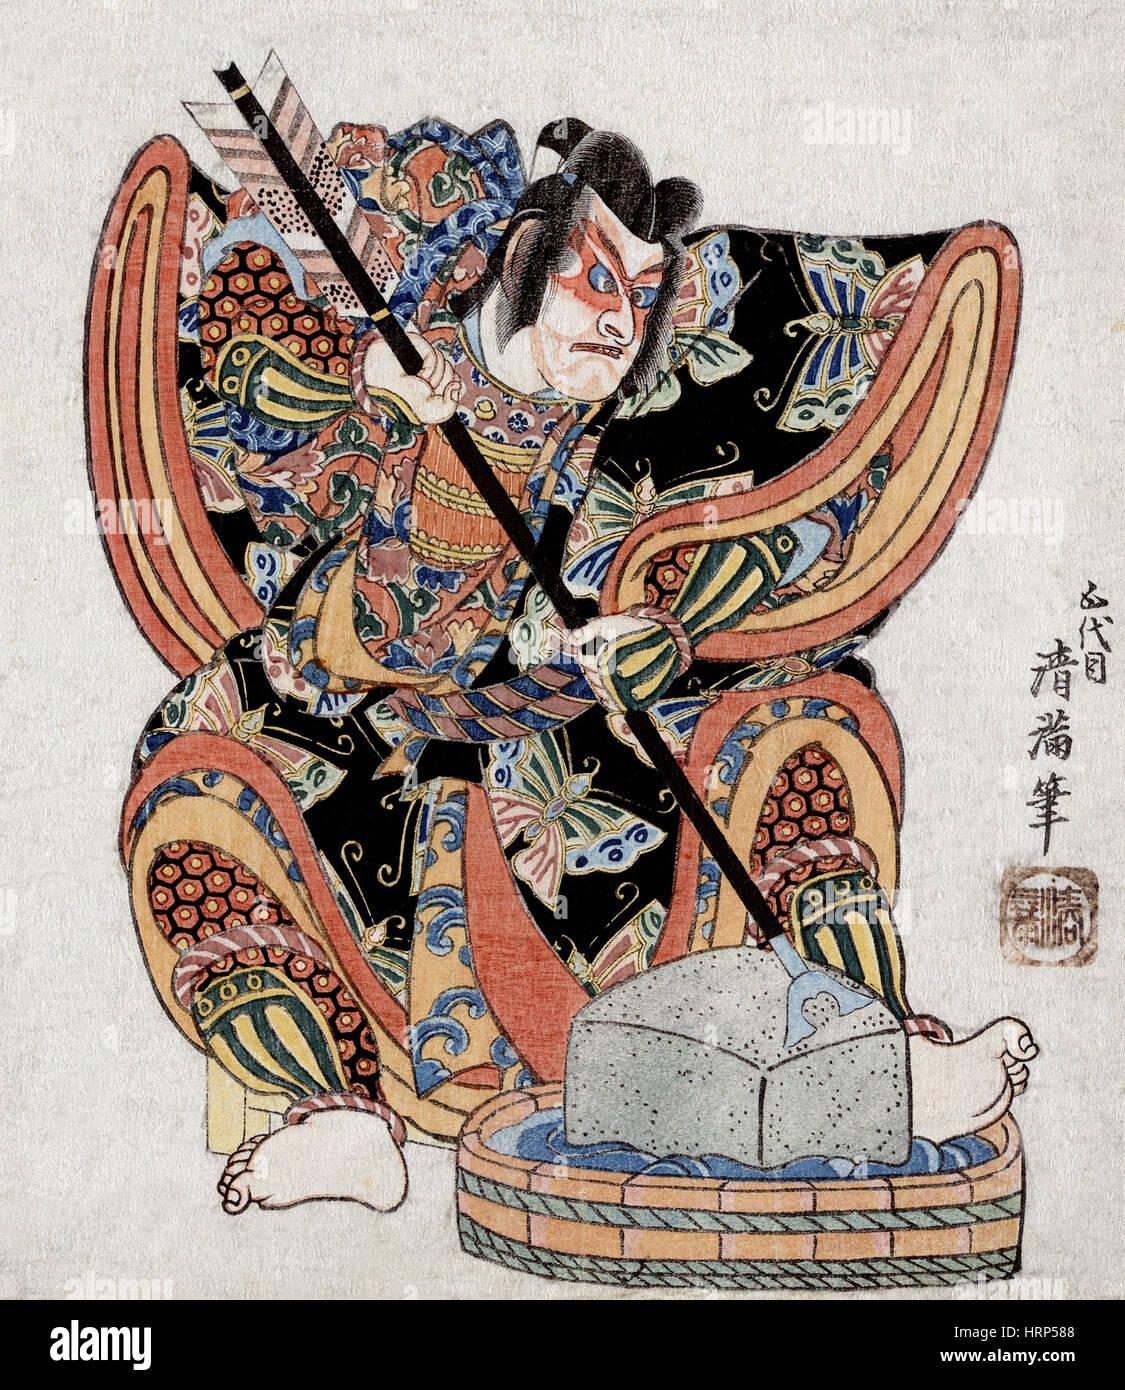 Samurai Warriors Immagini Stock